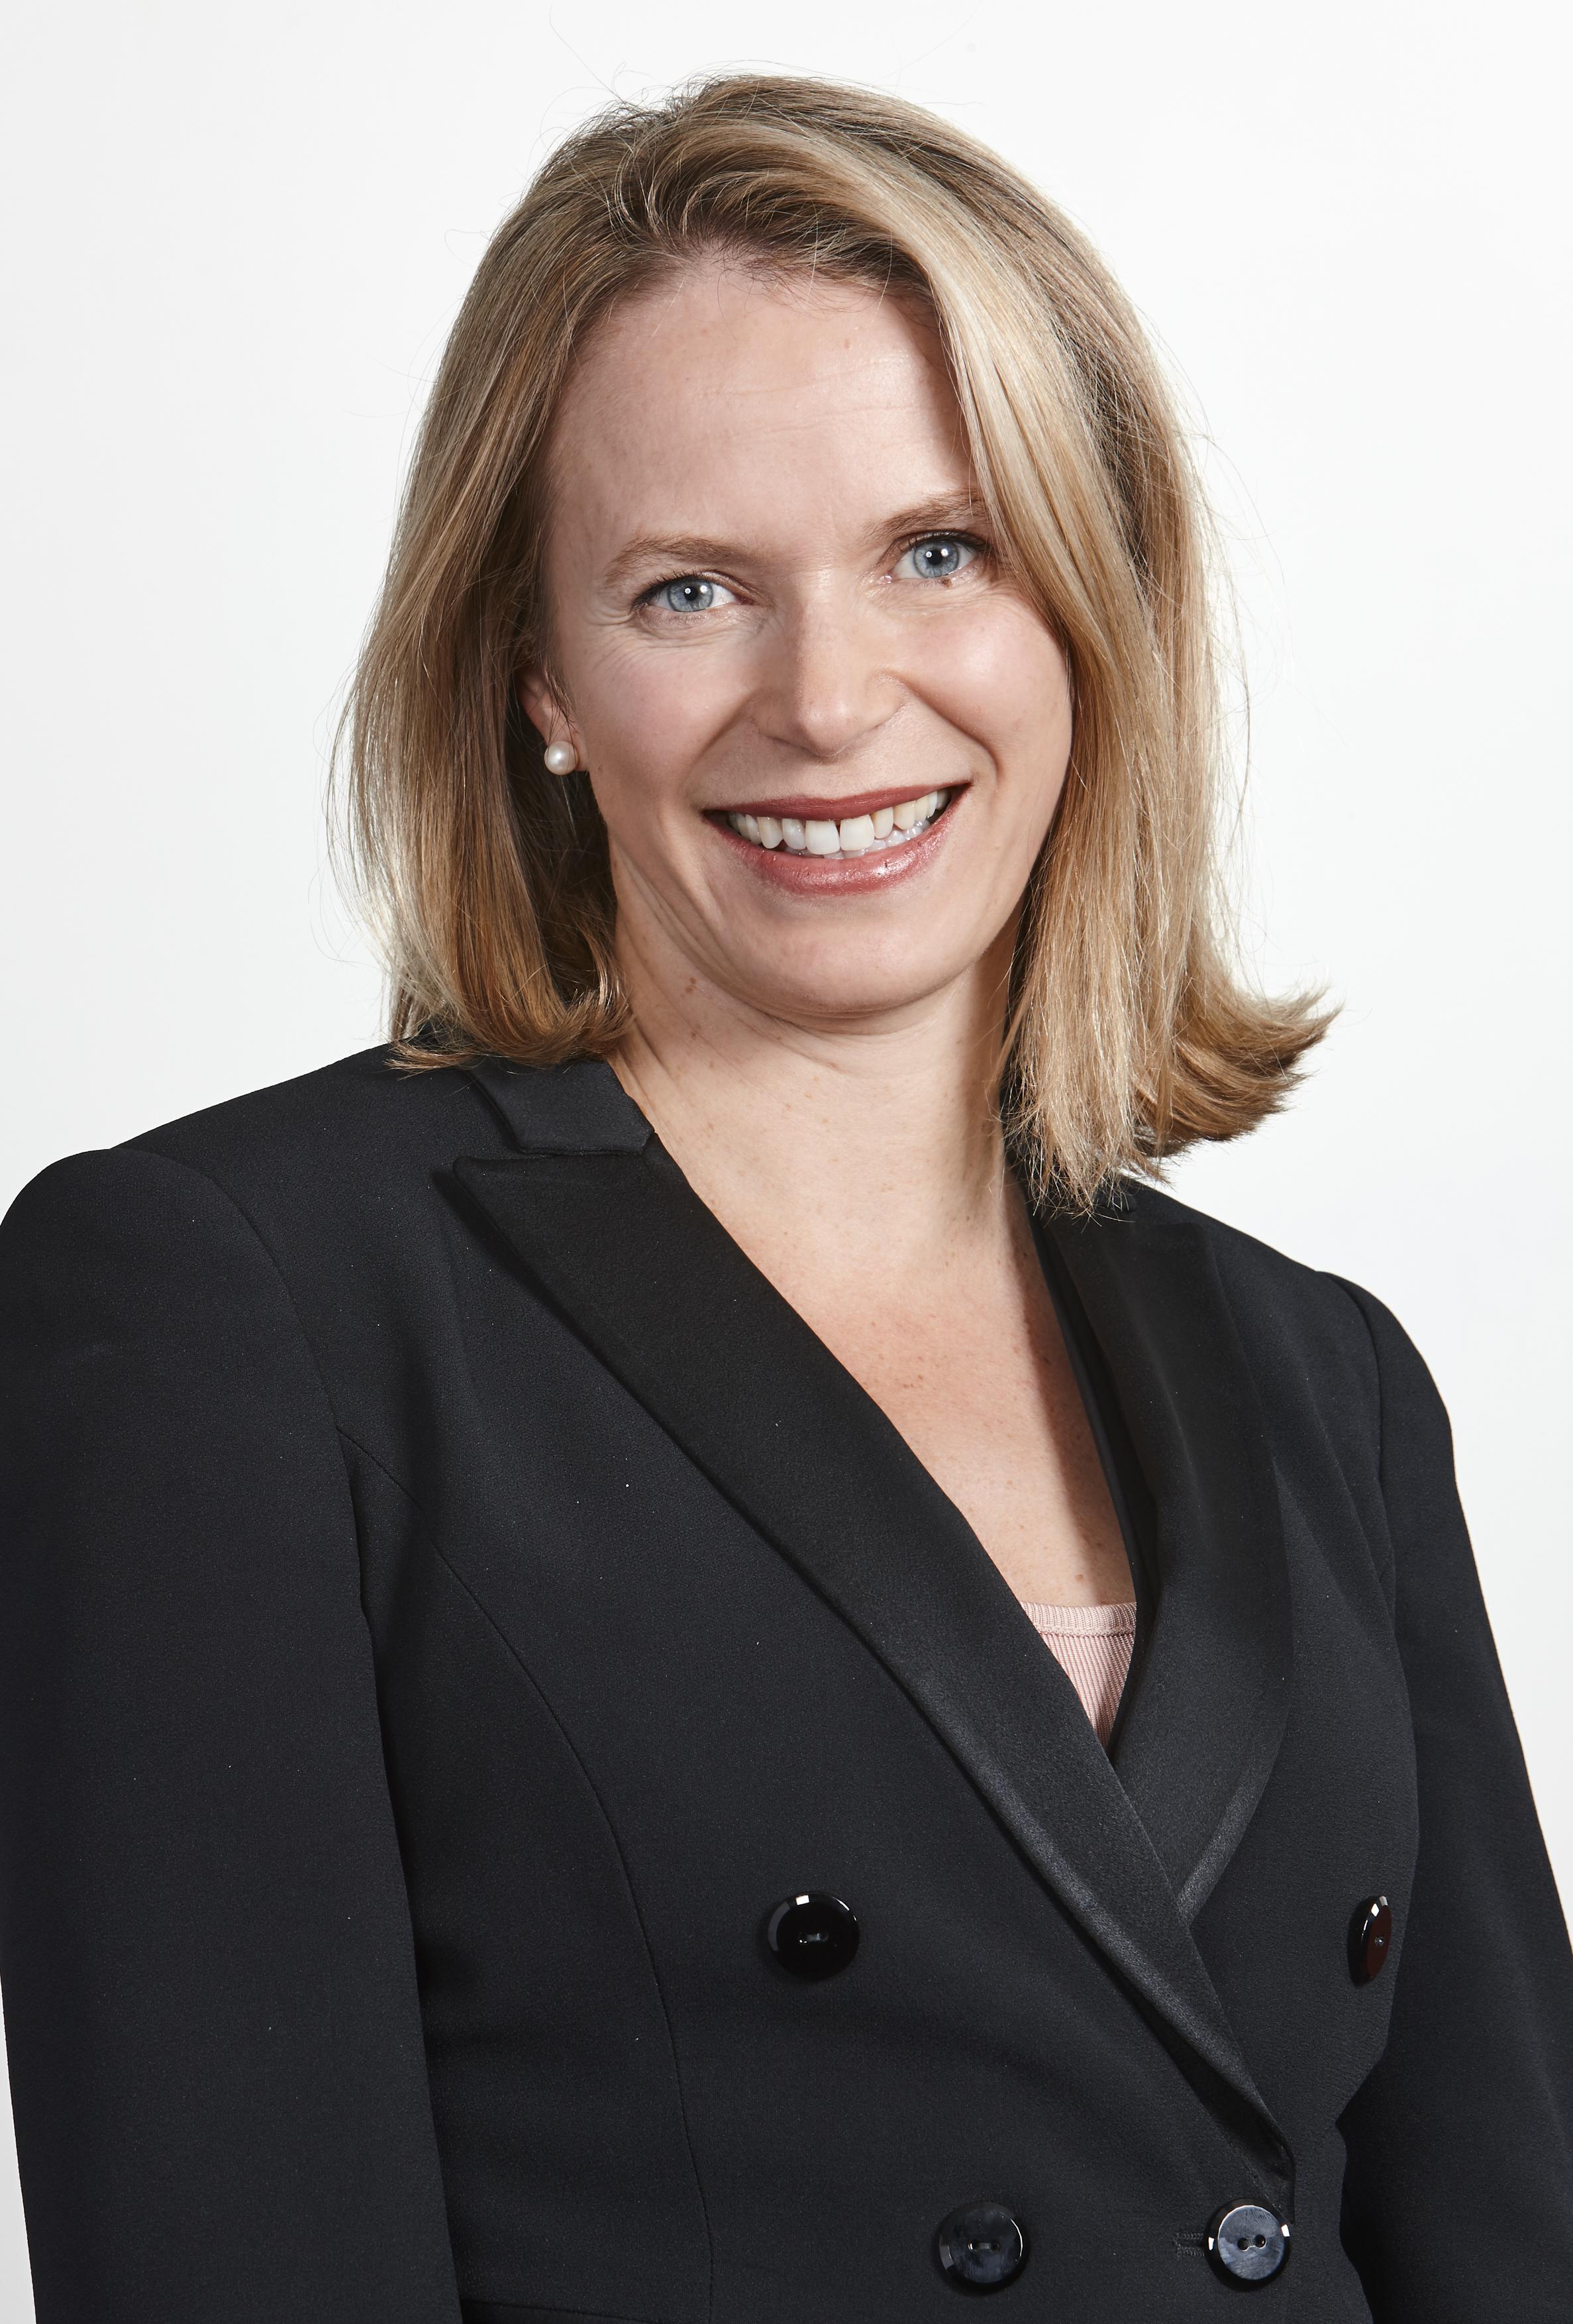 Jennifer Cowen, LLM, LLB(Hons), BSc